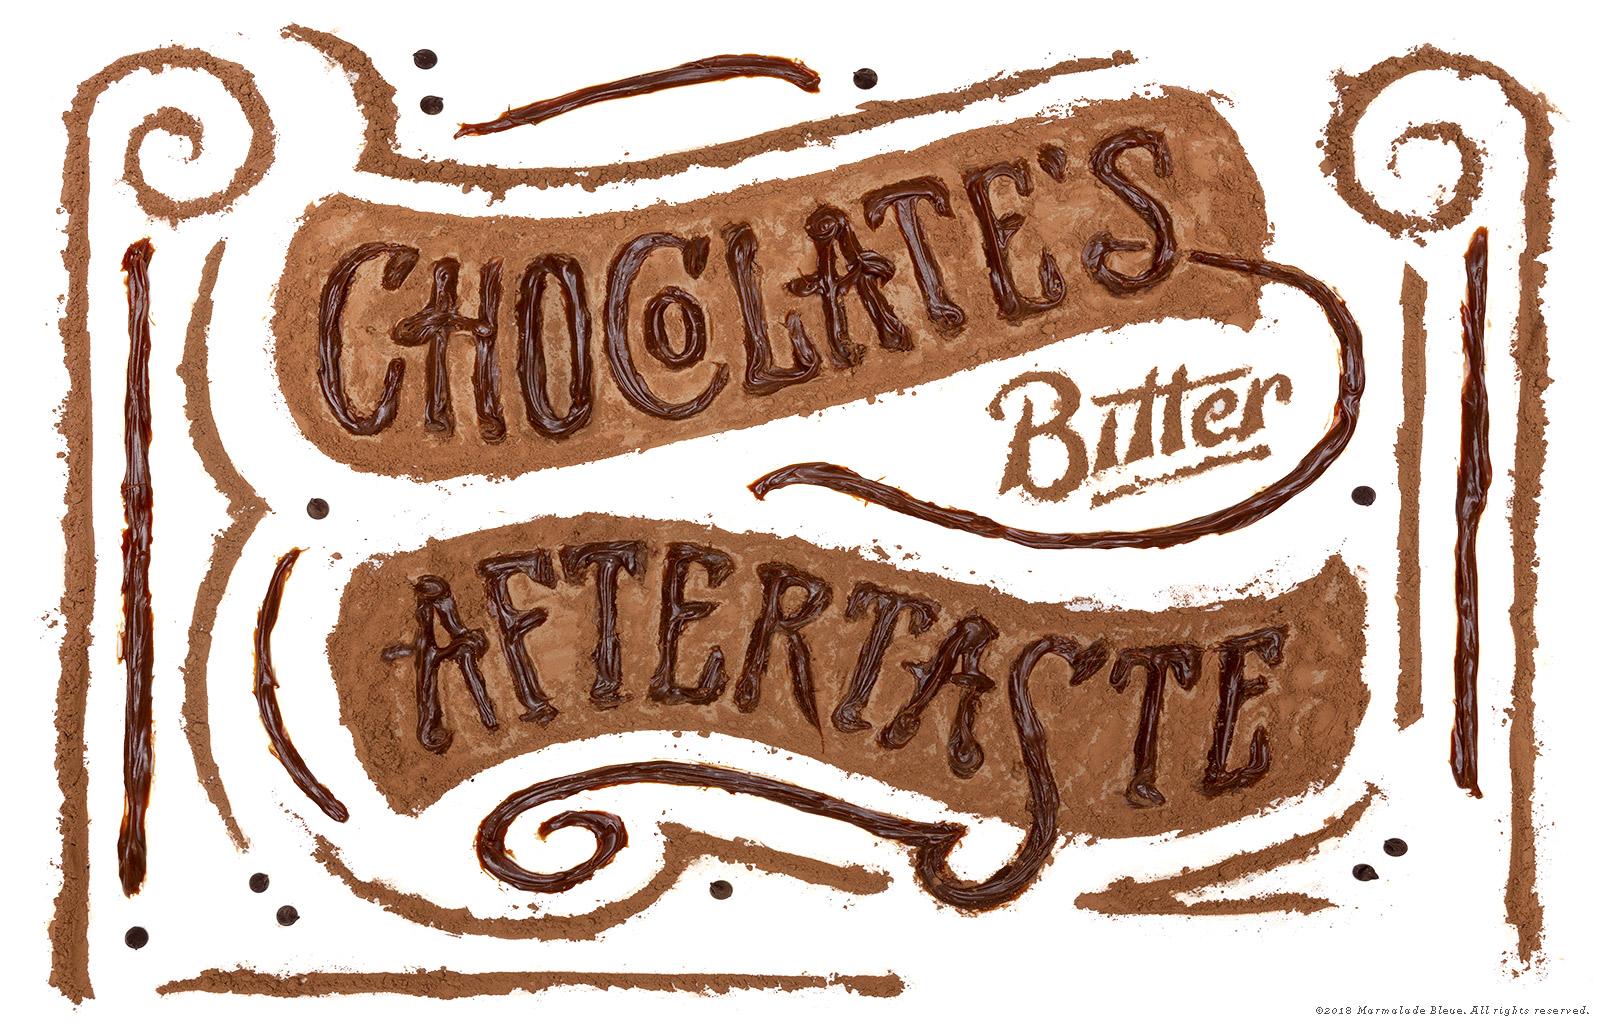 Oberlin-Chocolate's-Aftertaste-final.jpg